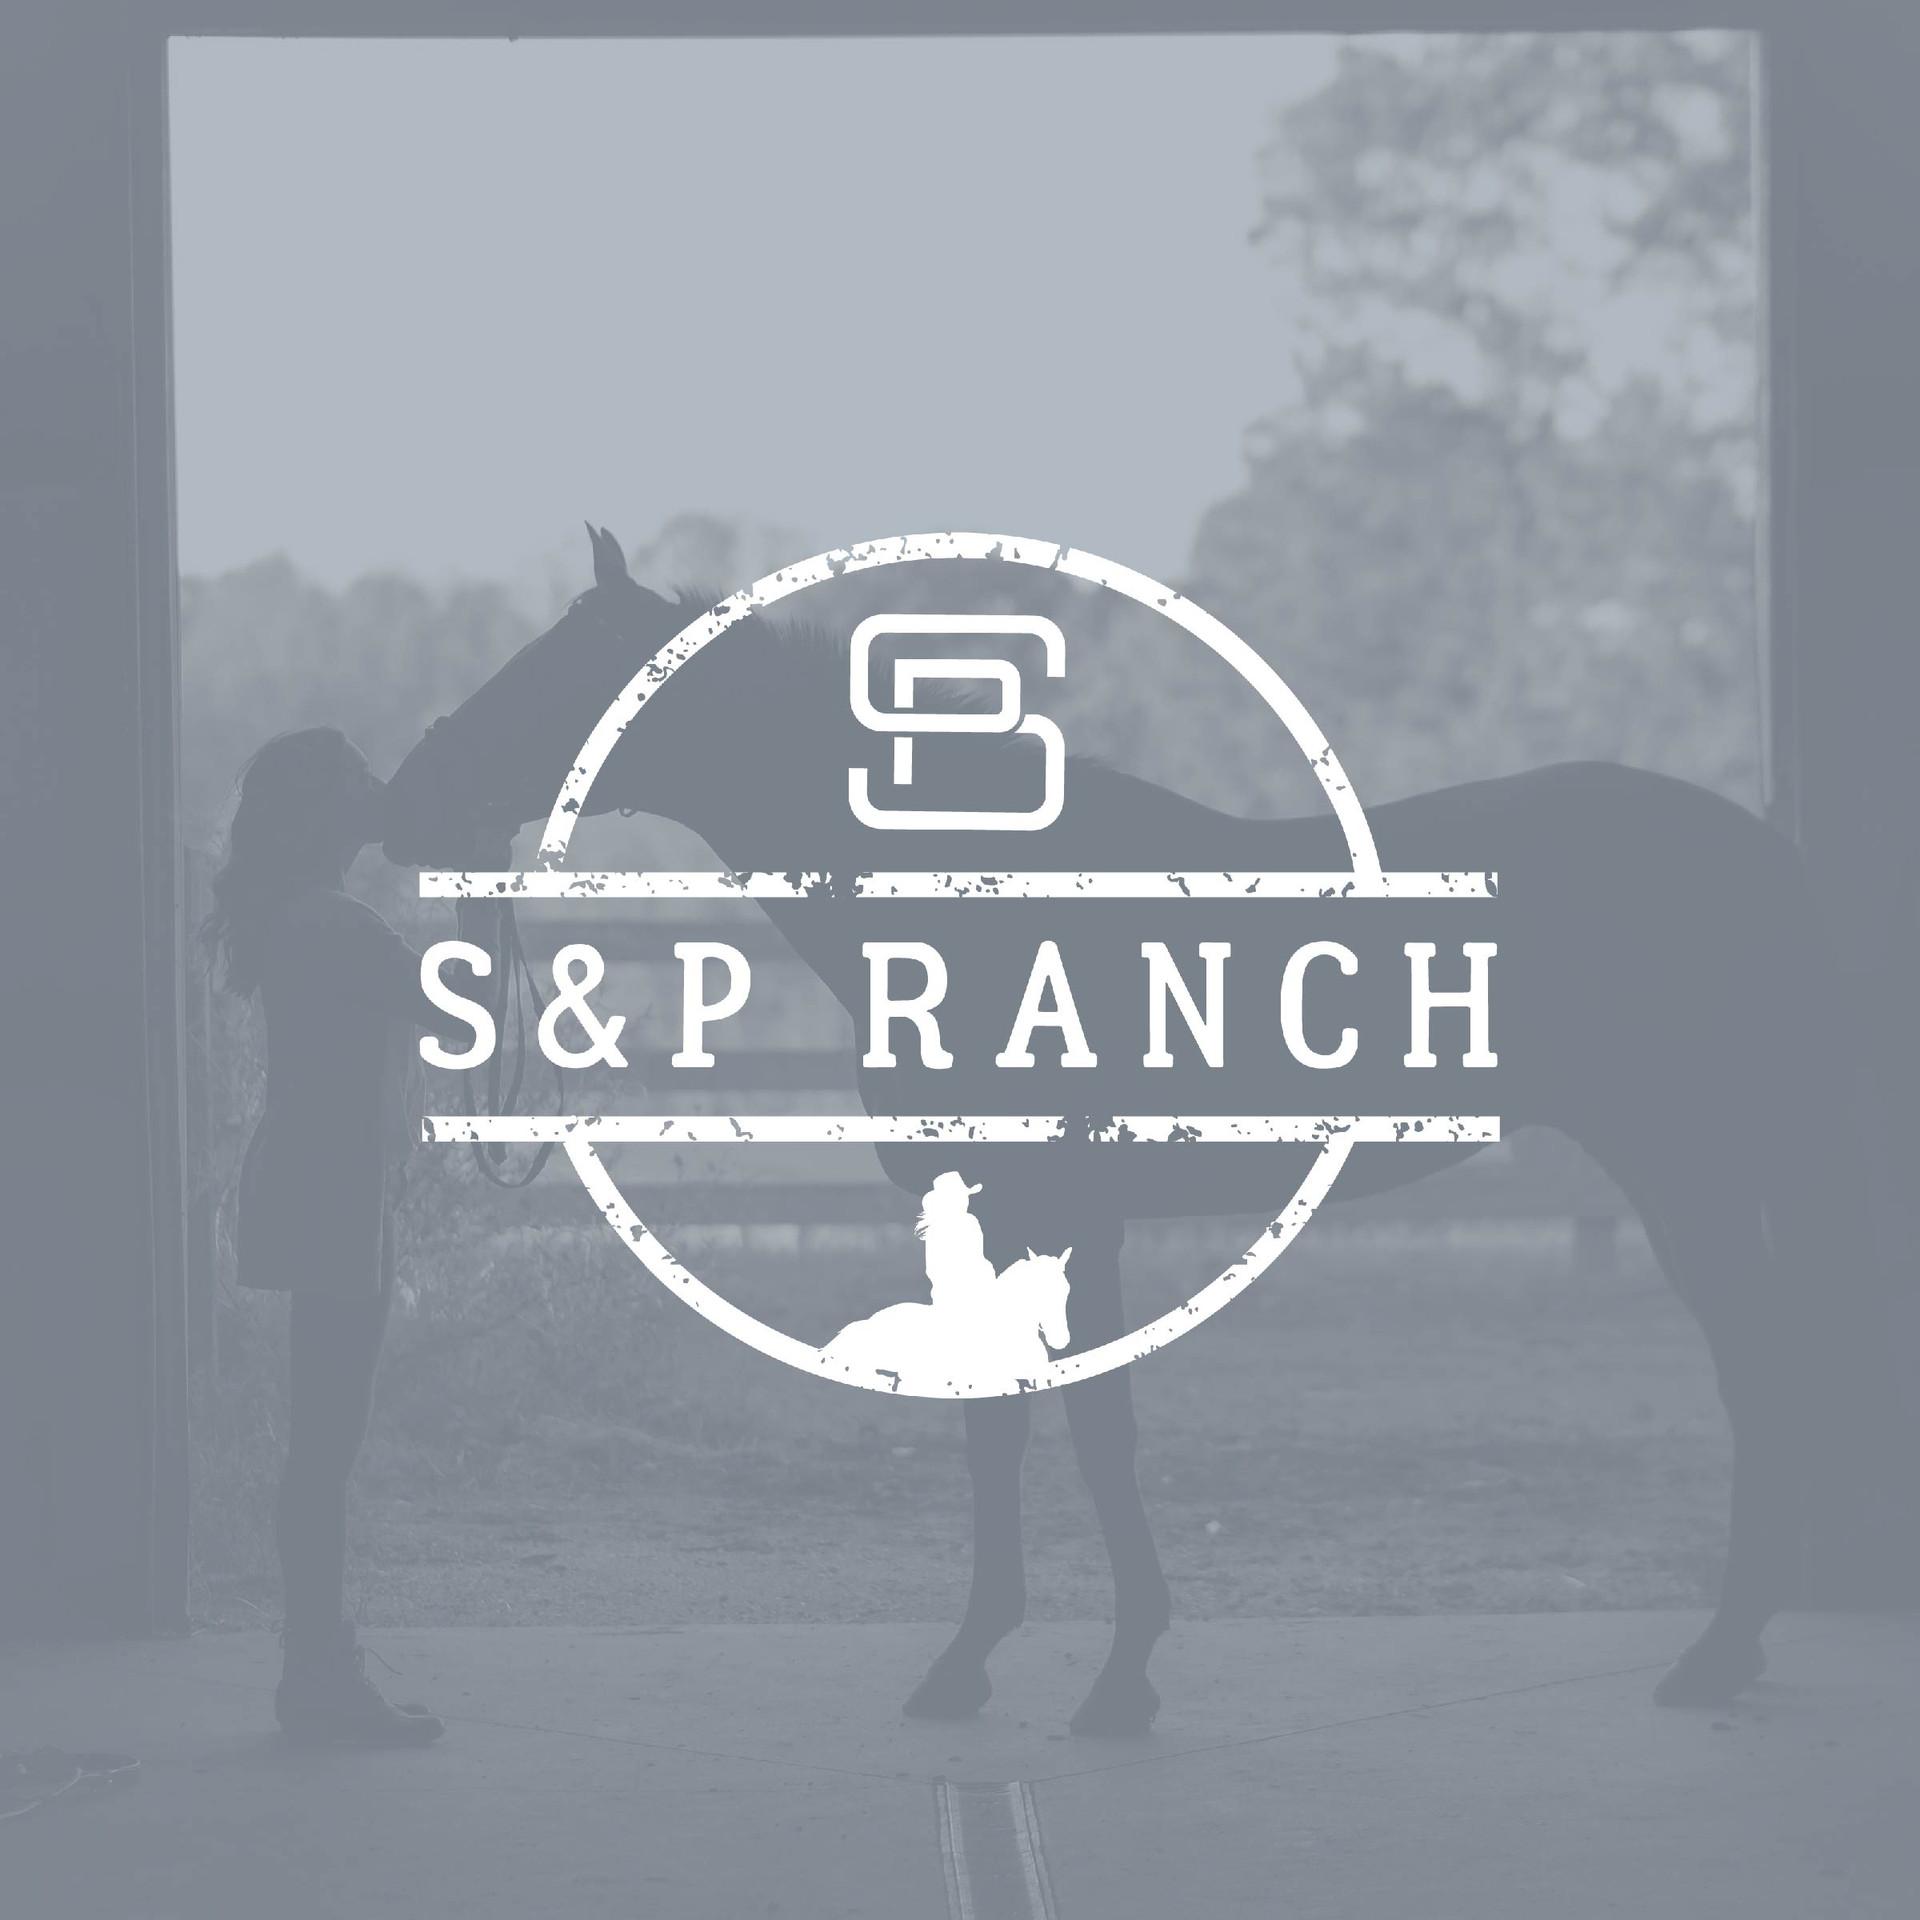 S&P Ranch